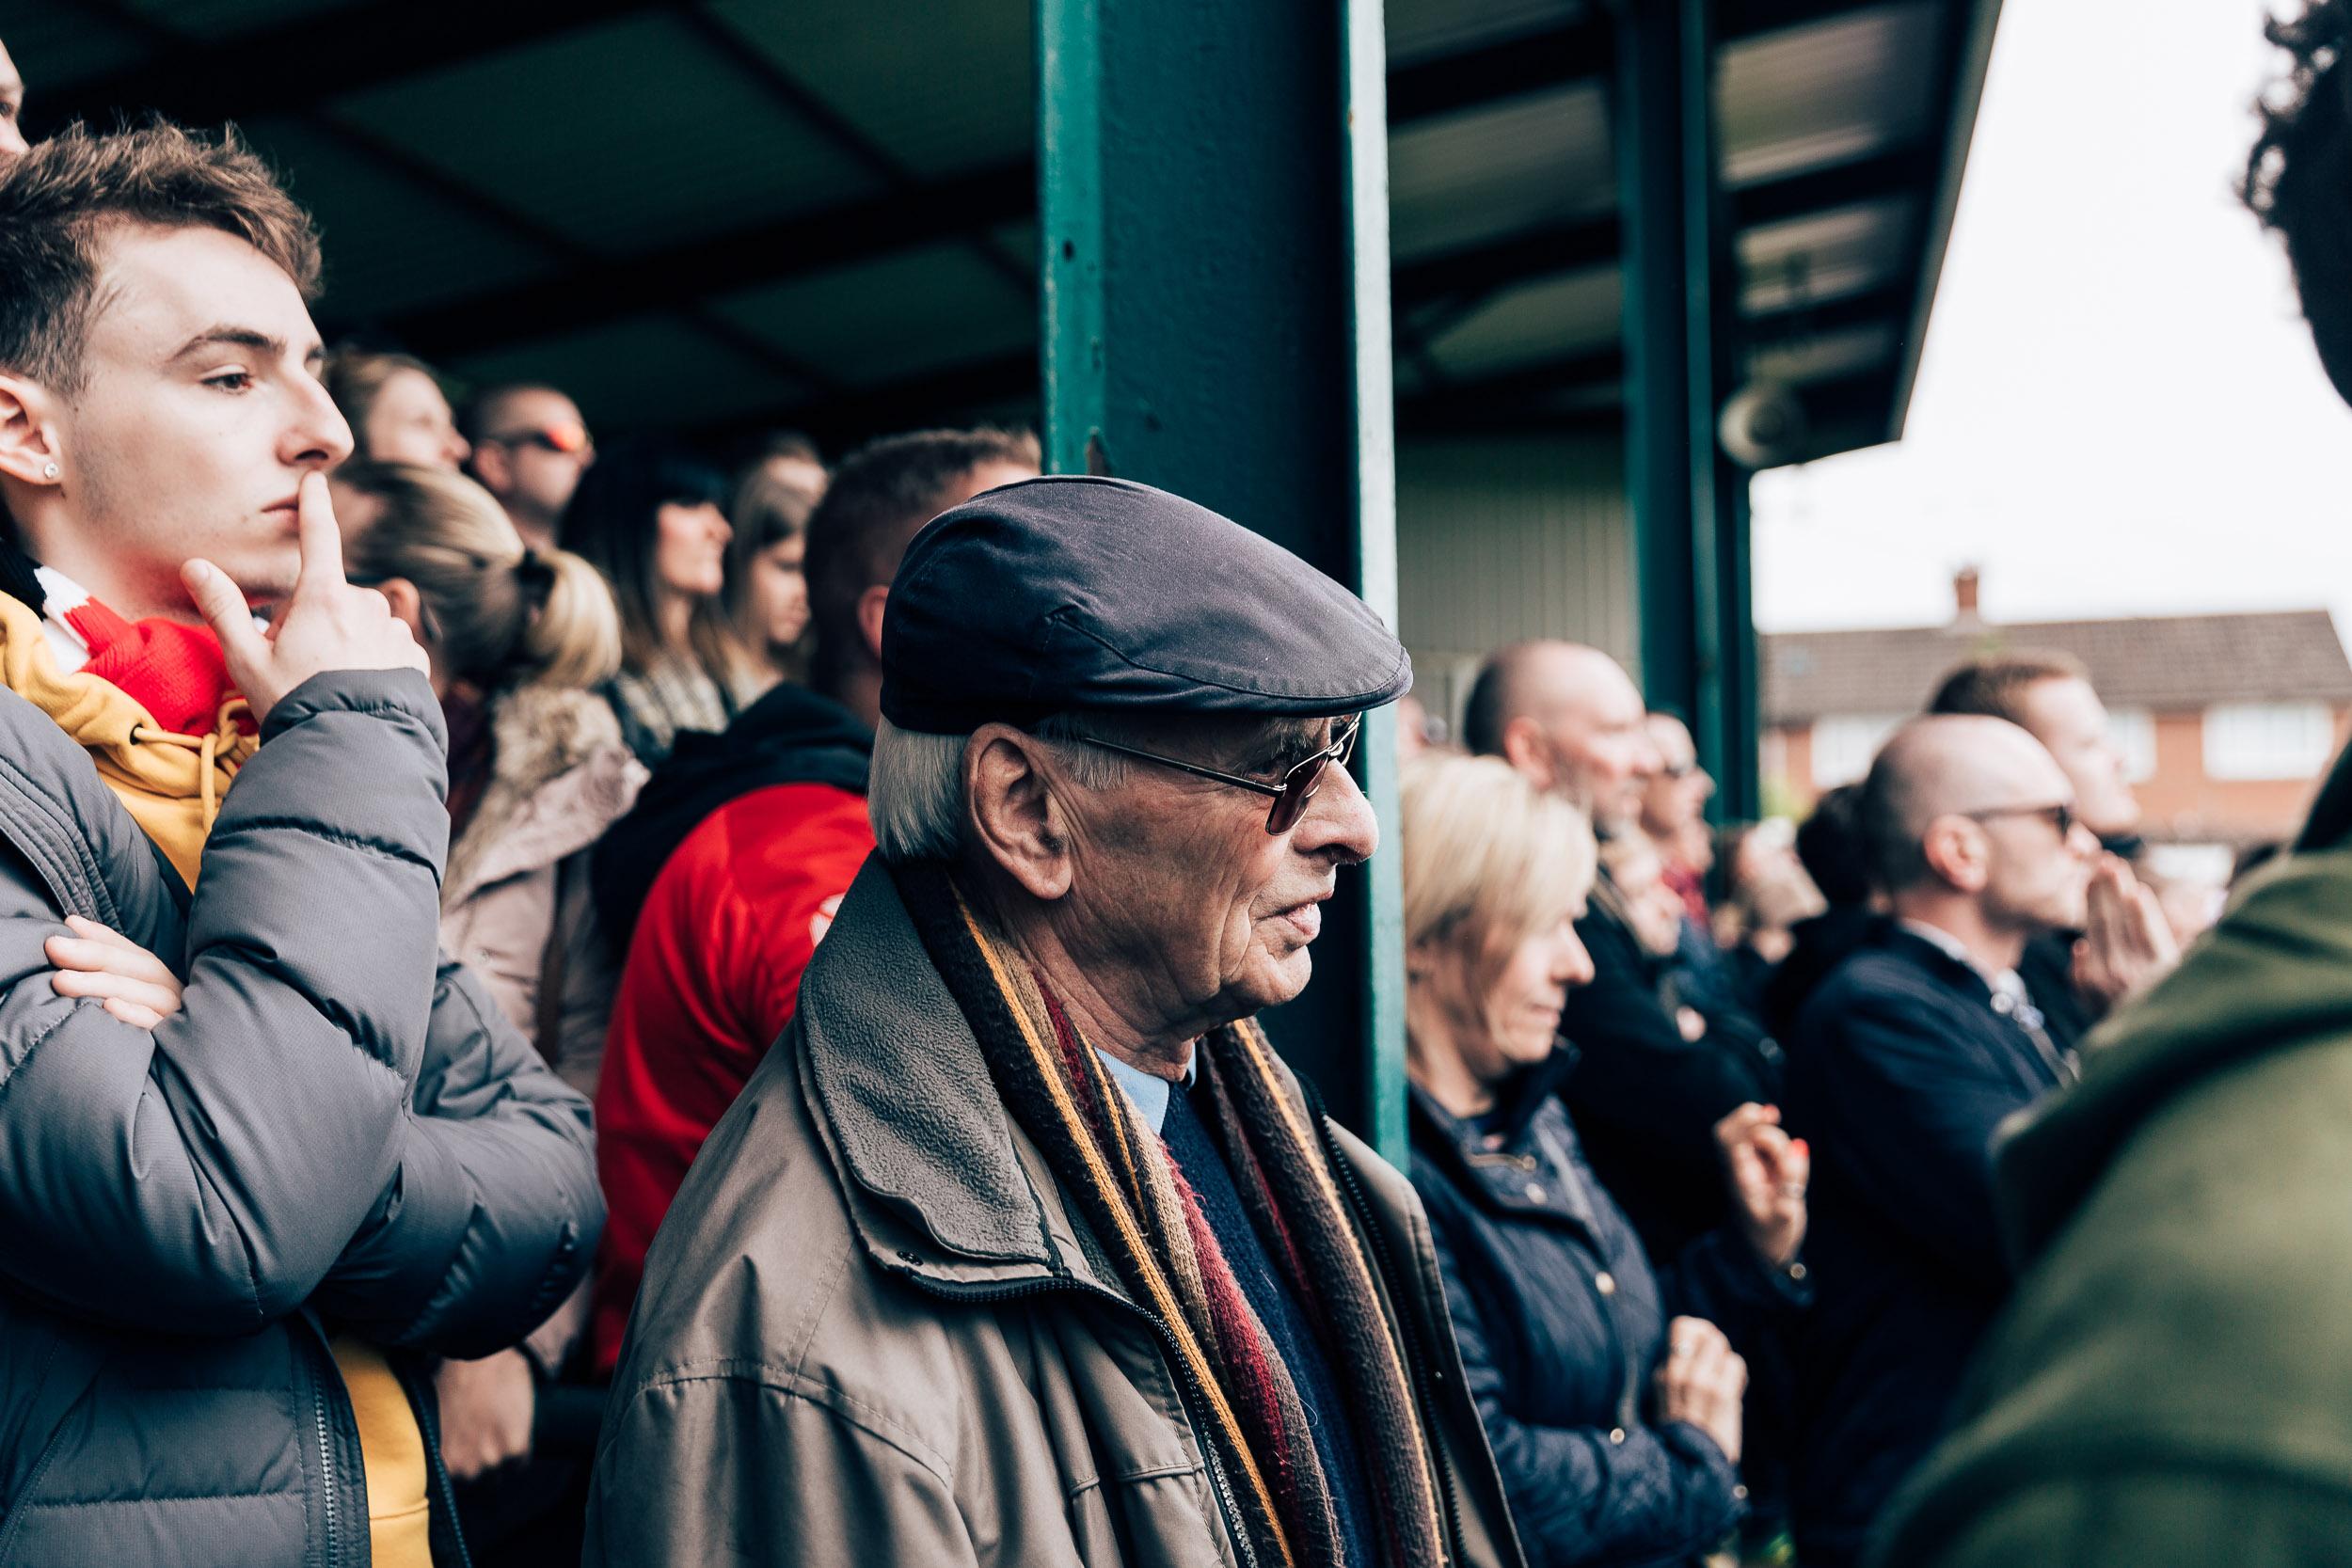 06_05_2019_Bromsgrove_Sporting_Corby-172.jpg